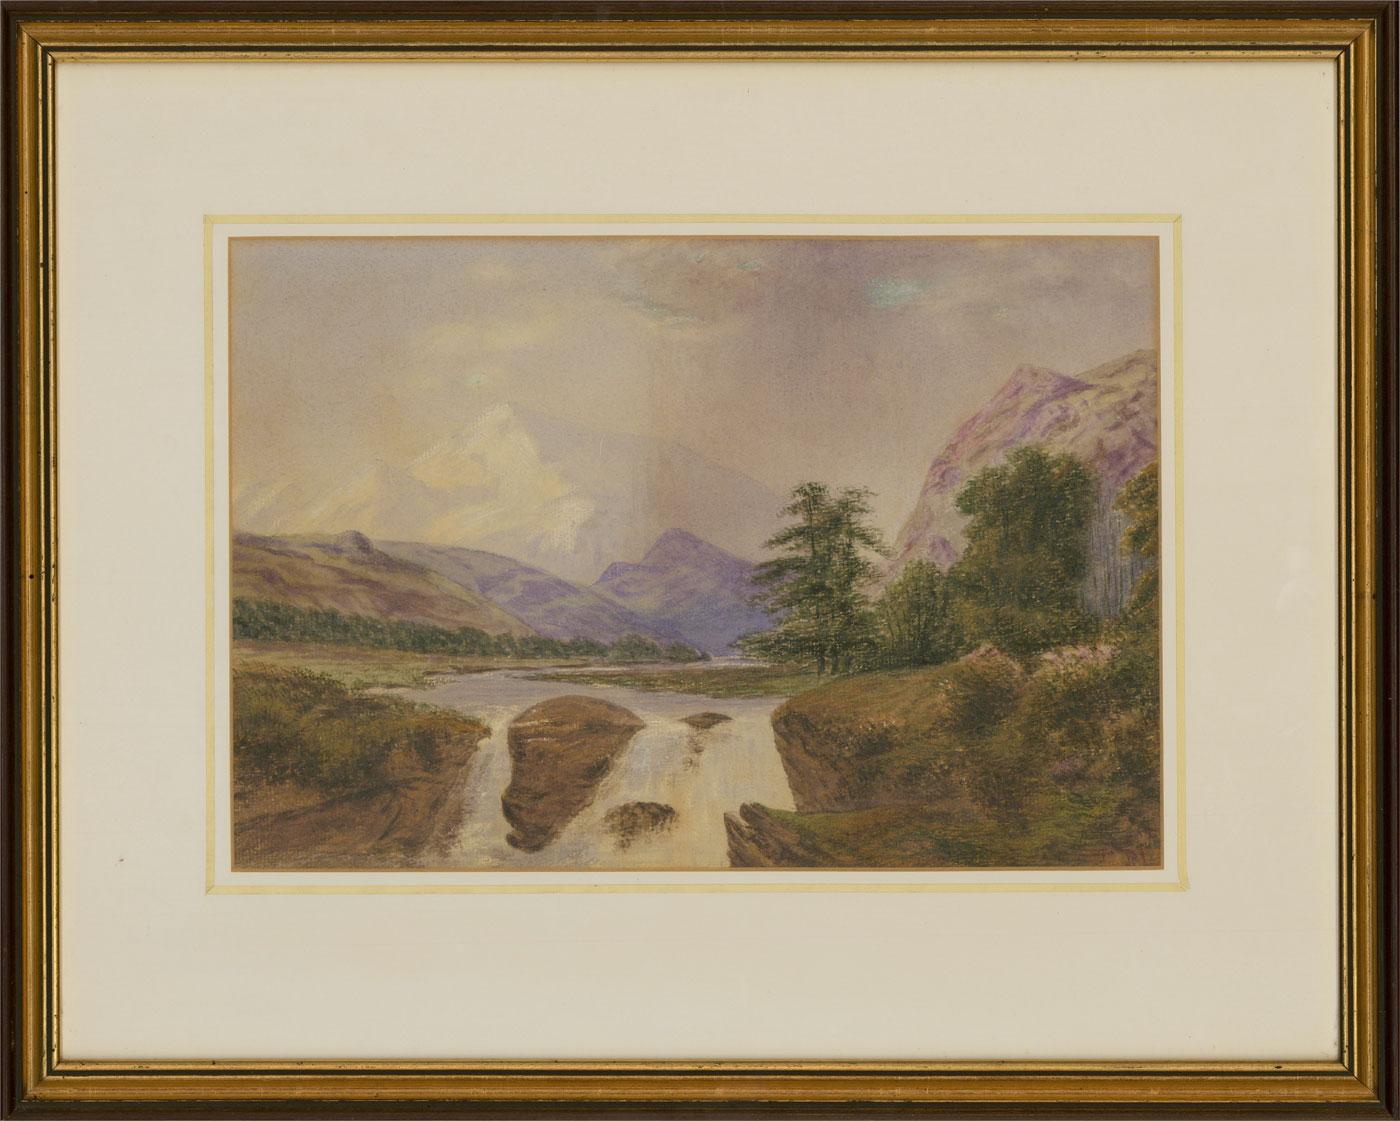 J. Story - 1874 Watercolour, Mountainous Landscape with Waterfall